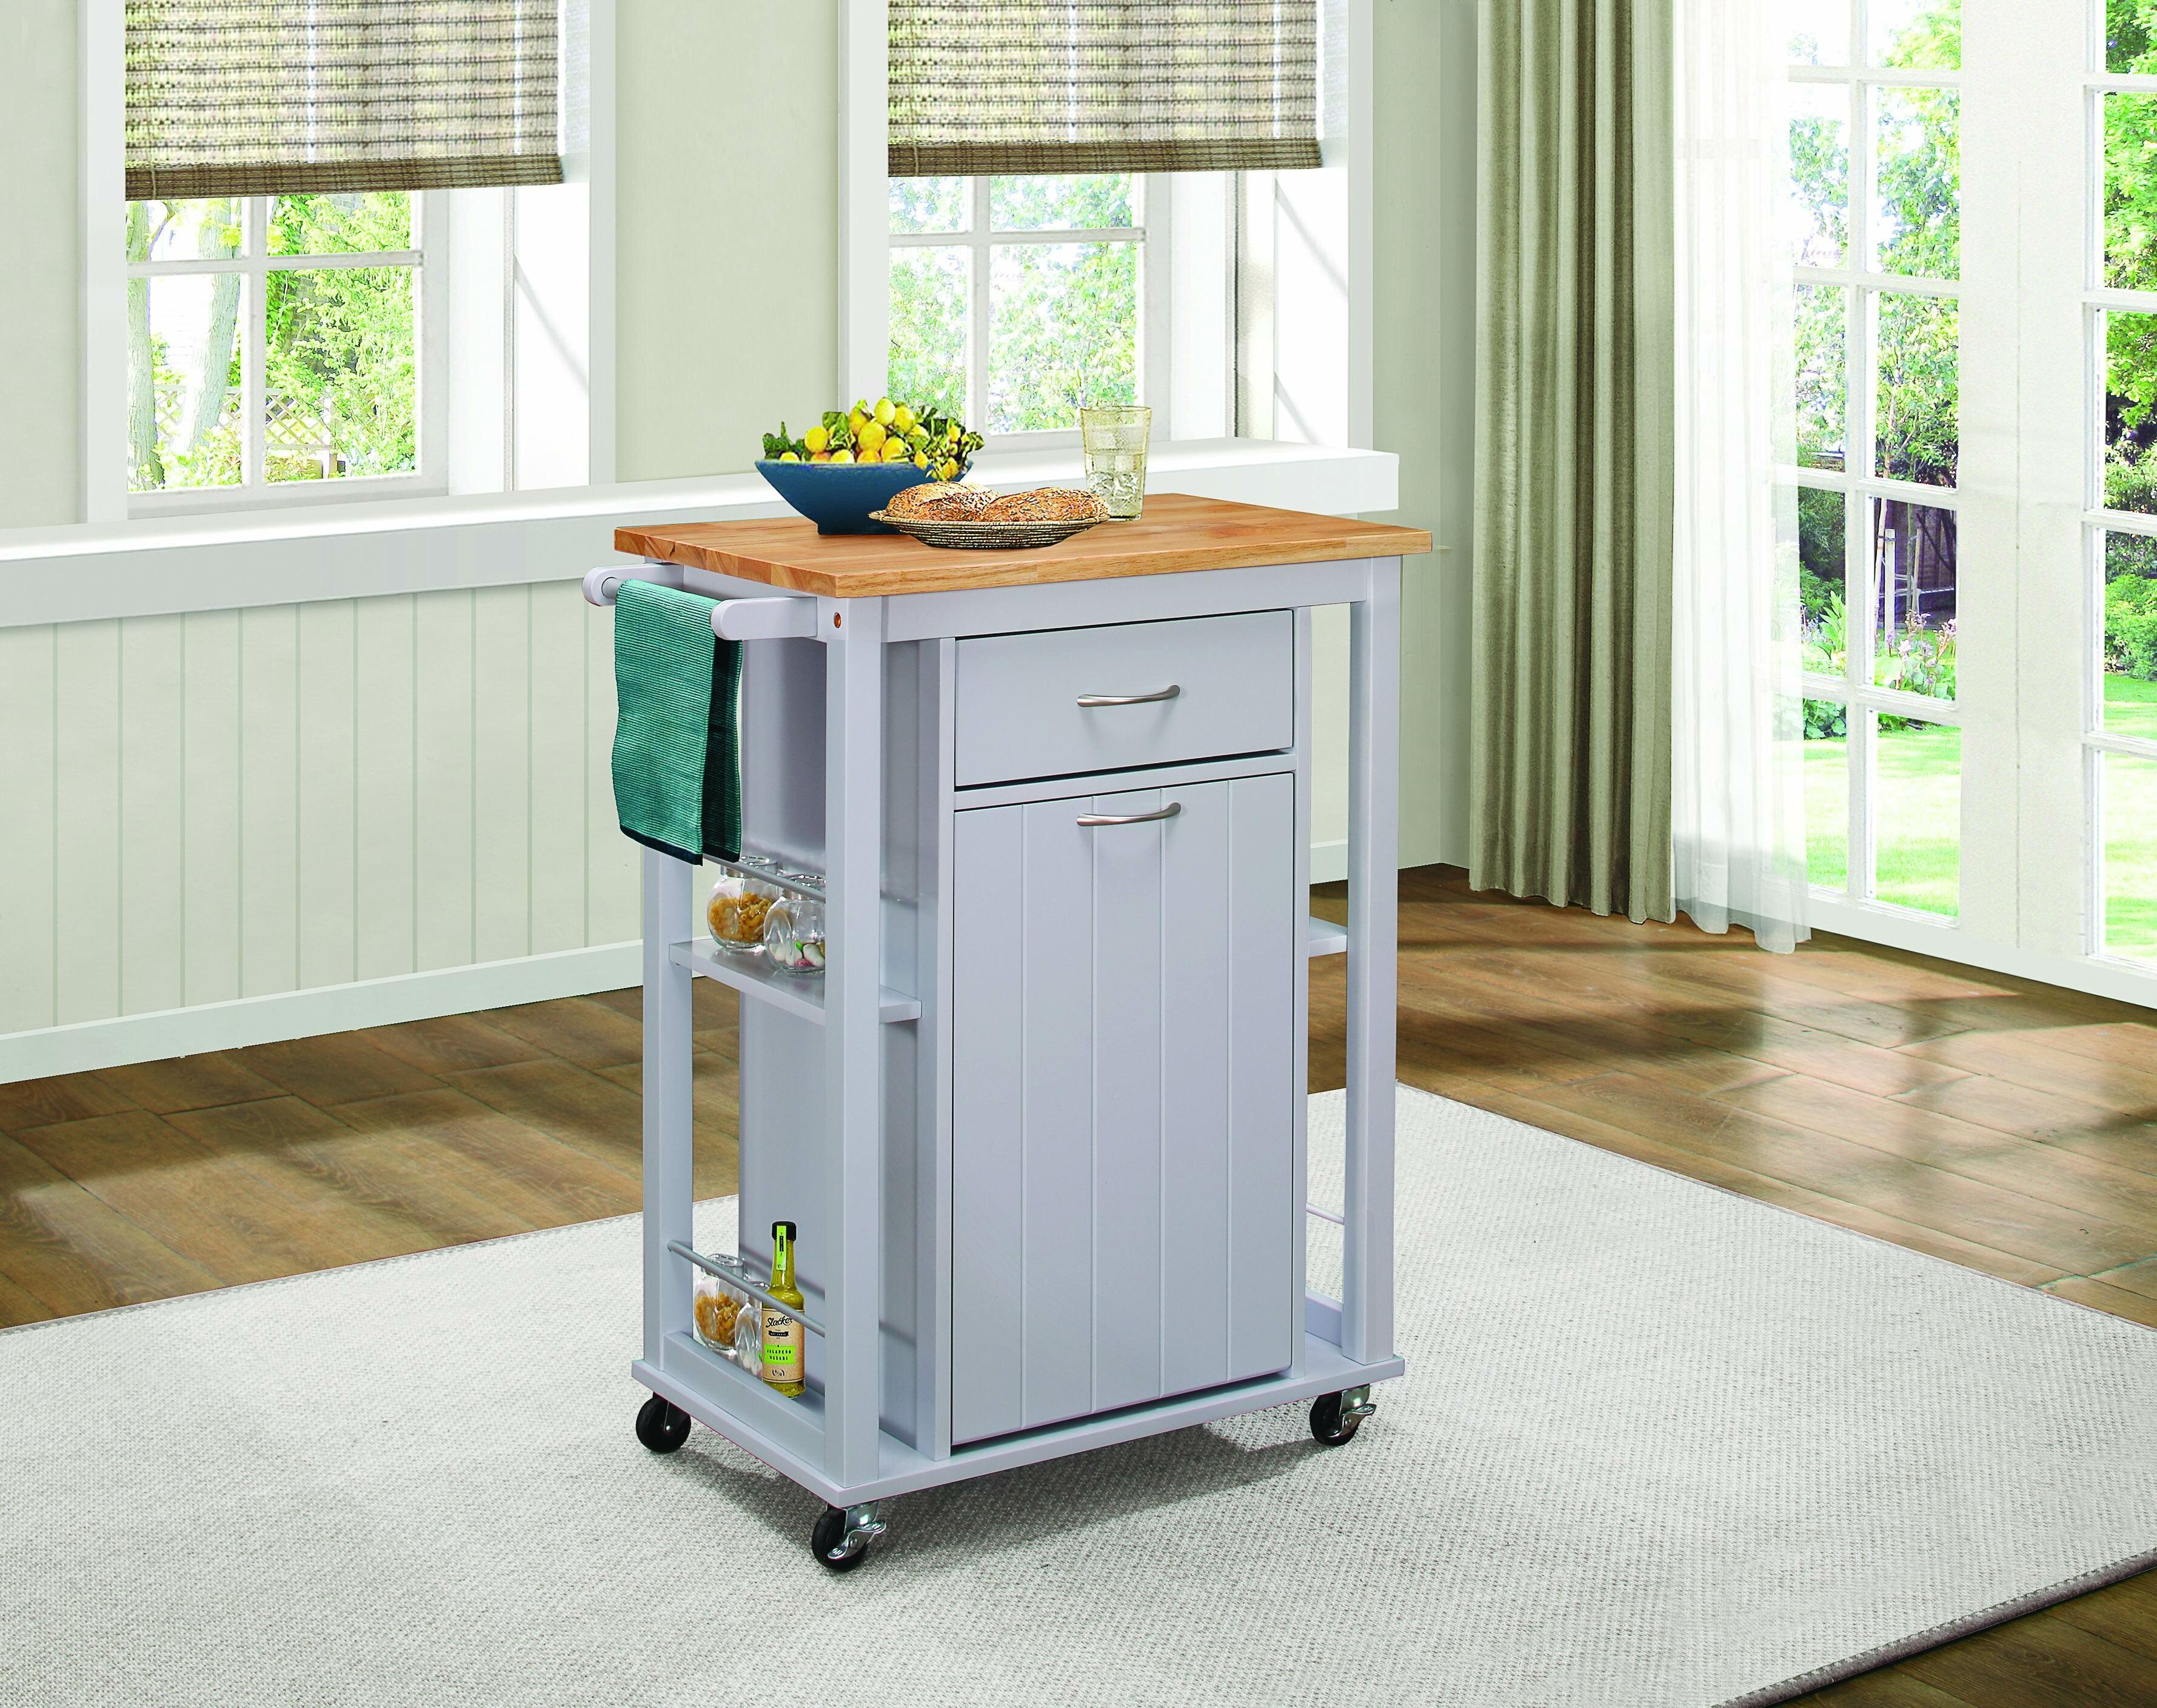 Darby Home Co Kempton Kitchen Cart | Wayfair